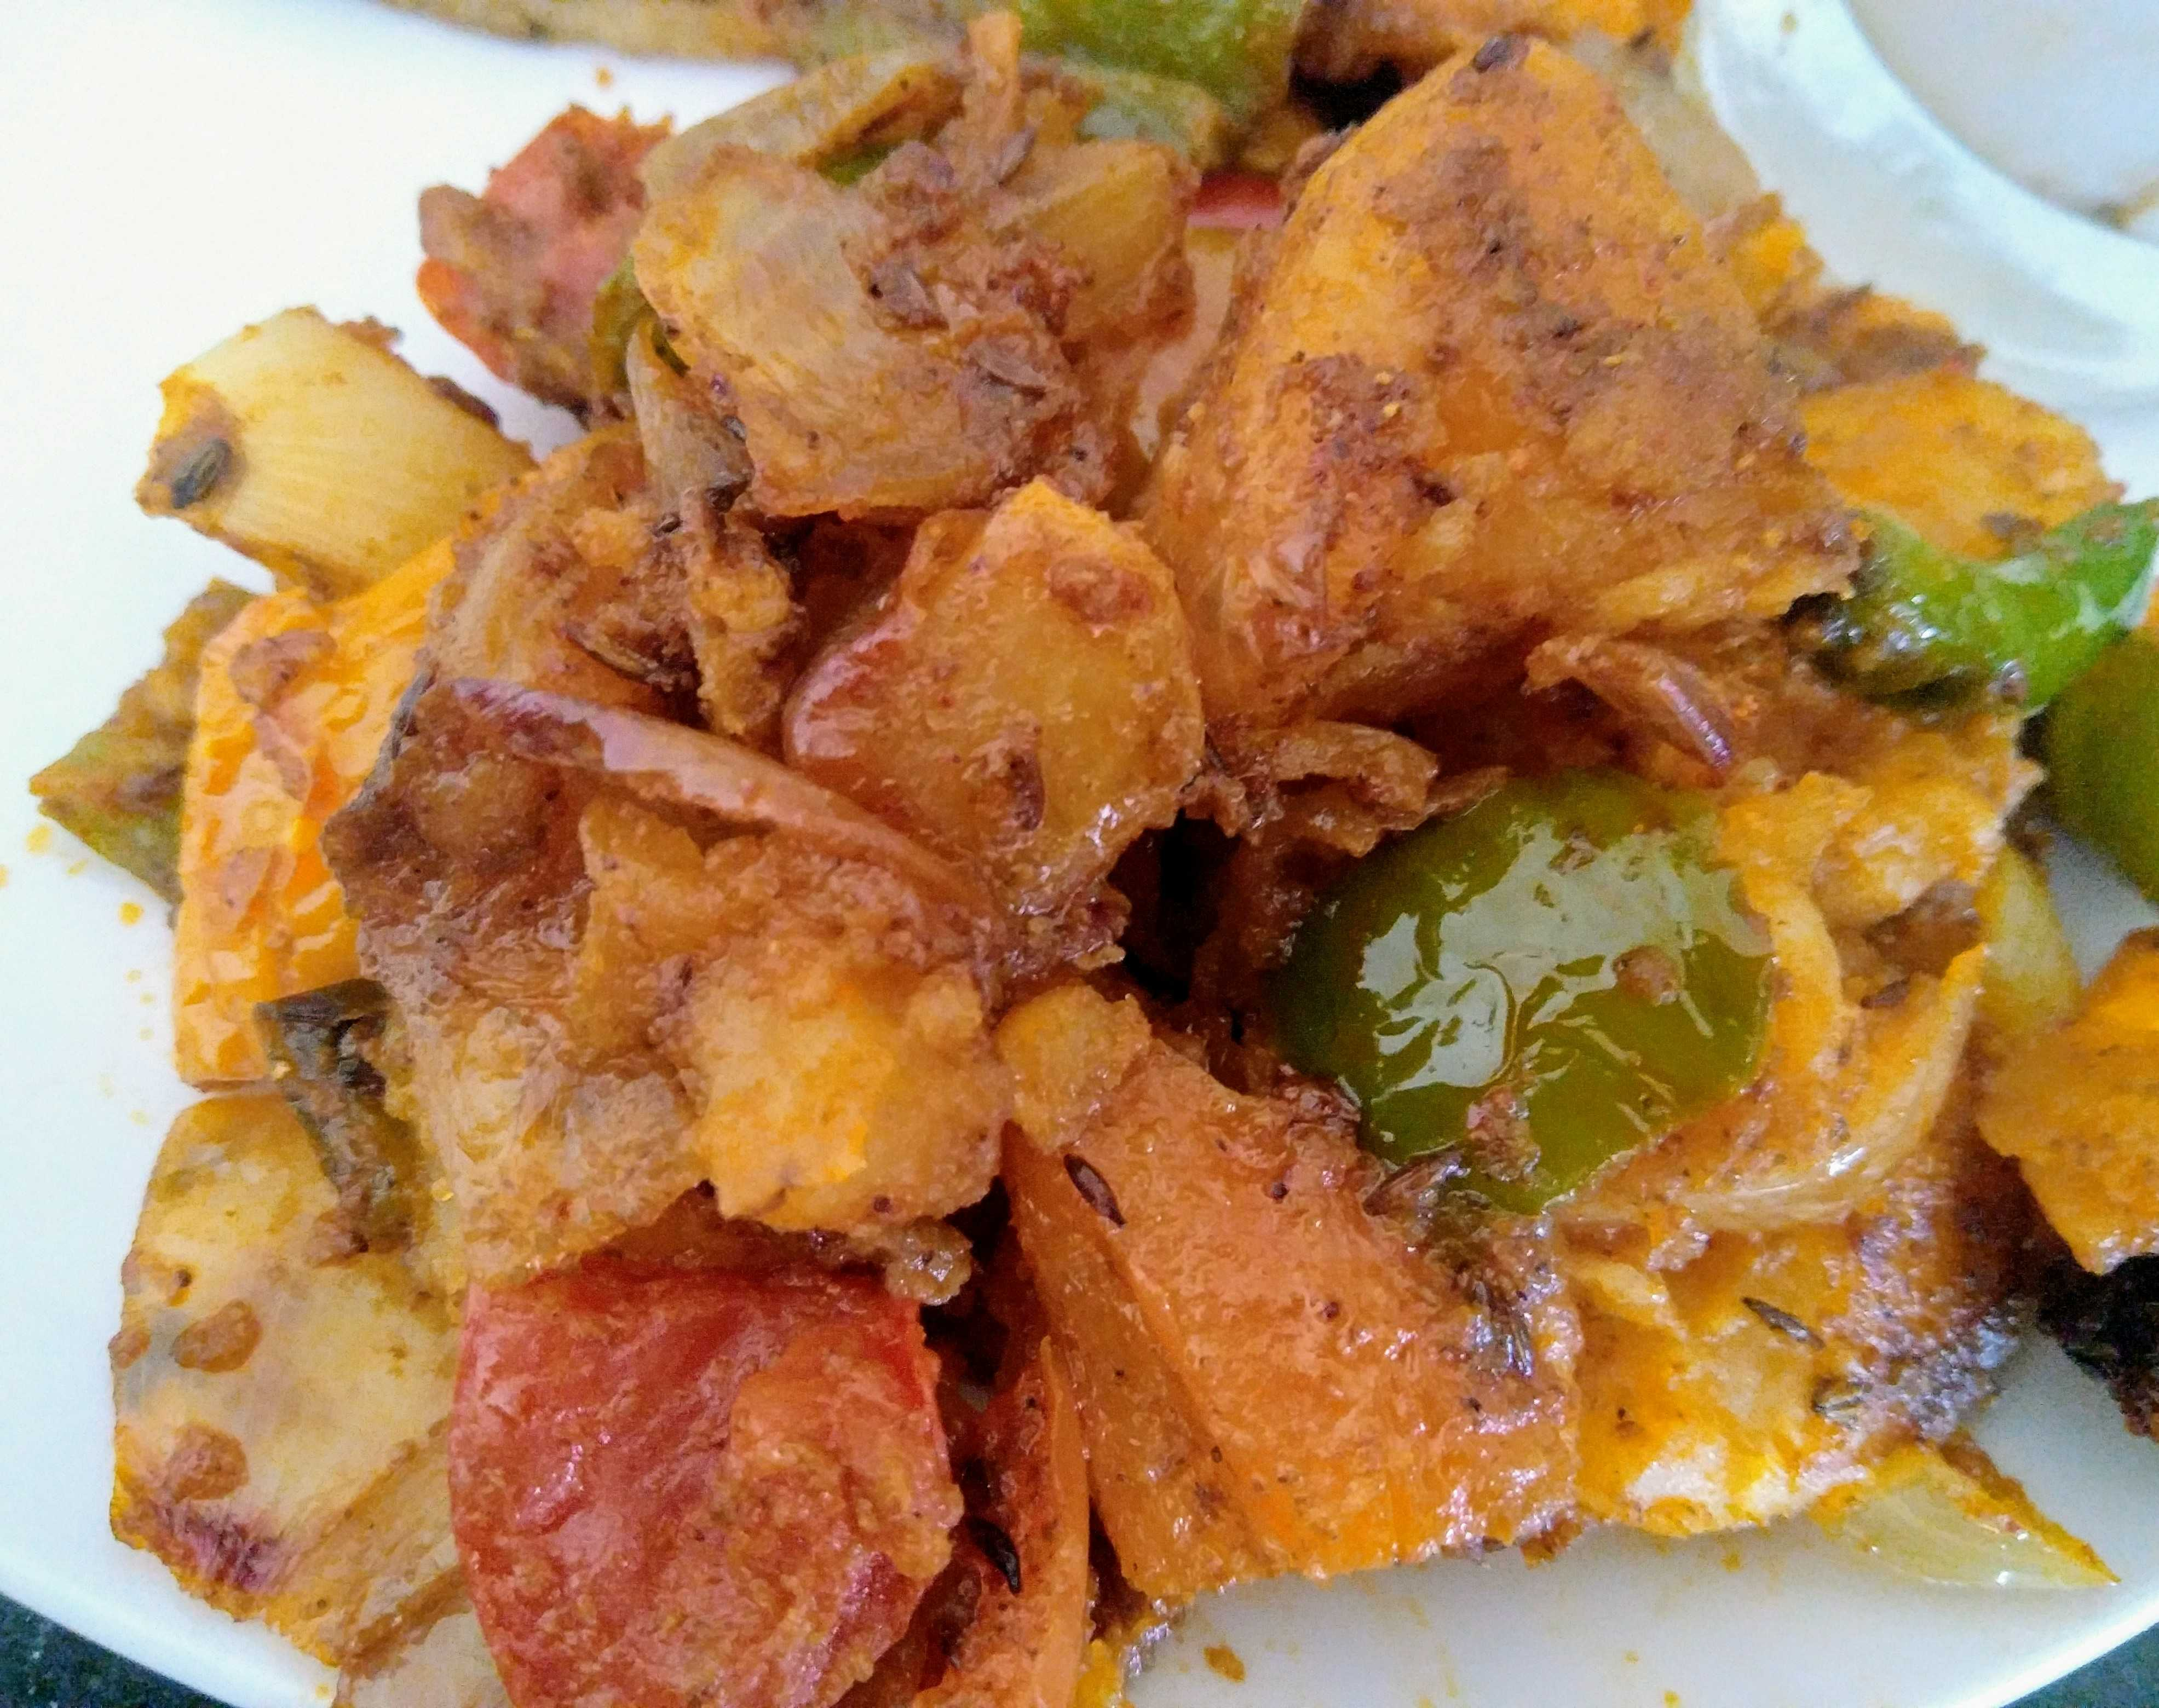 Potato/Aloo Capsicum Fry